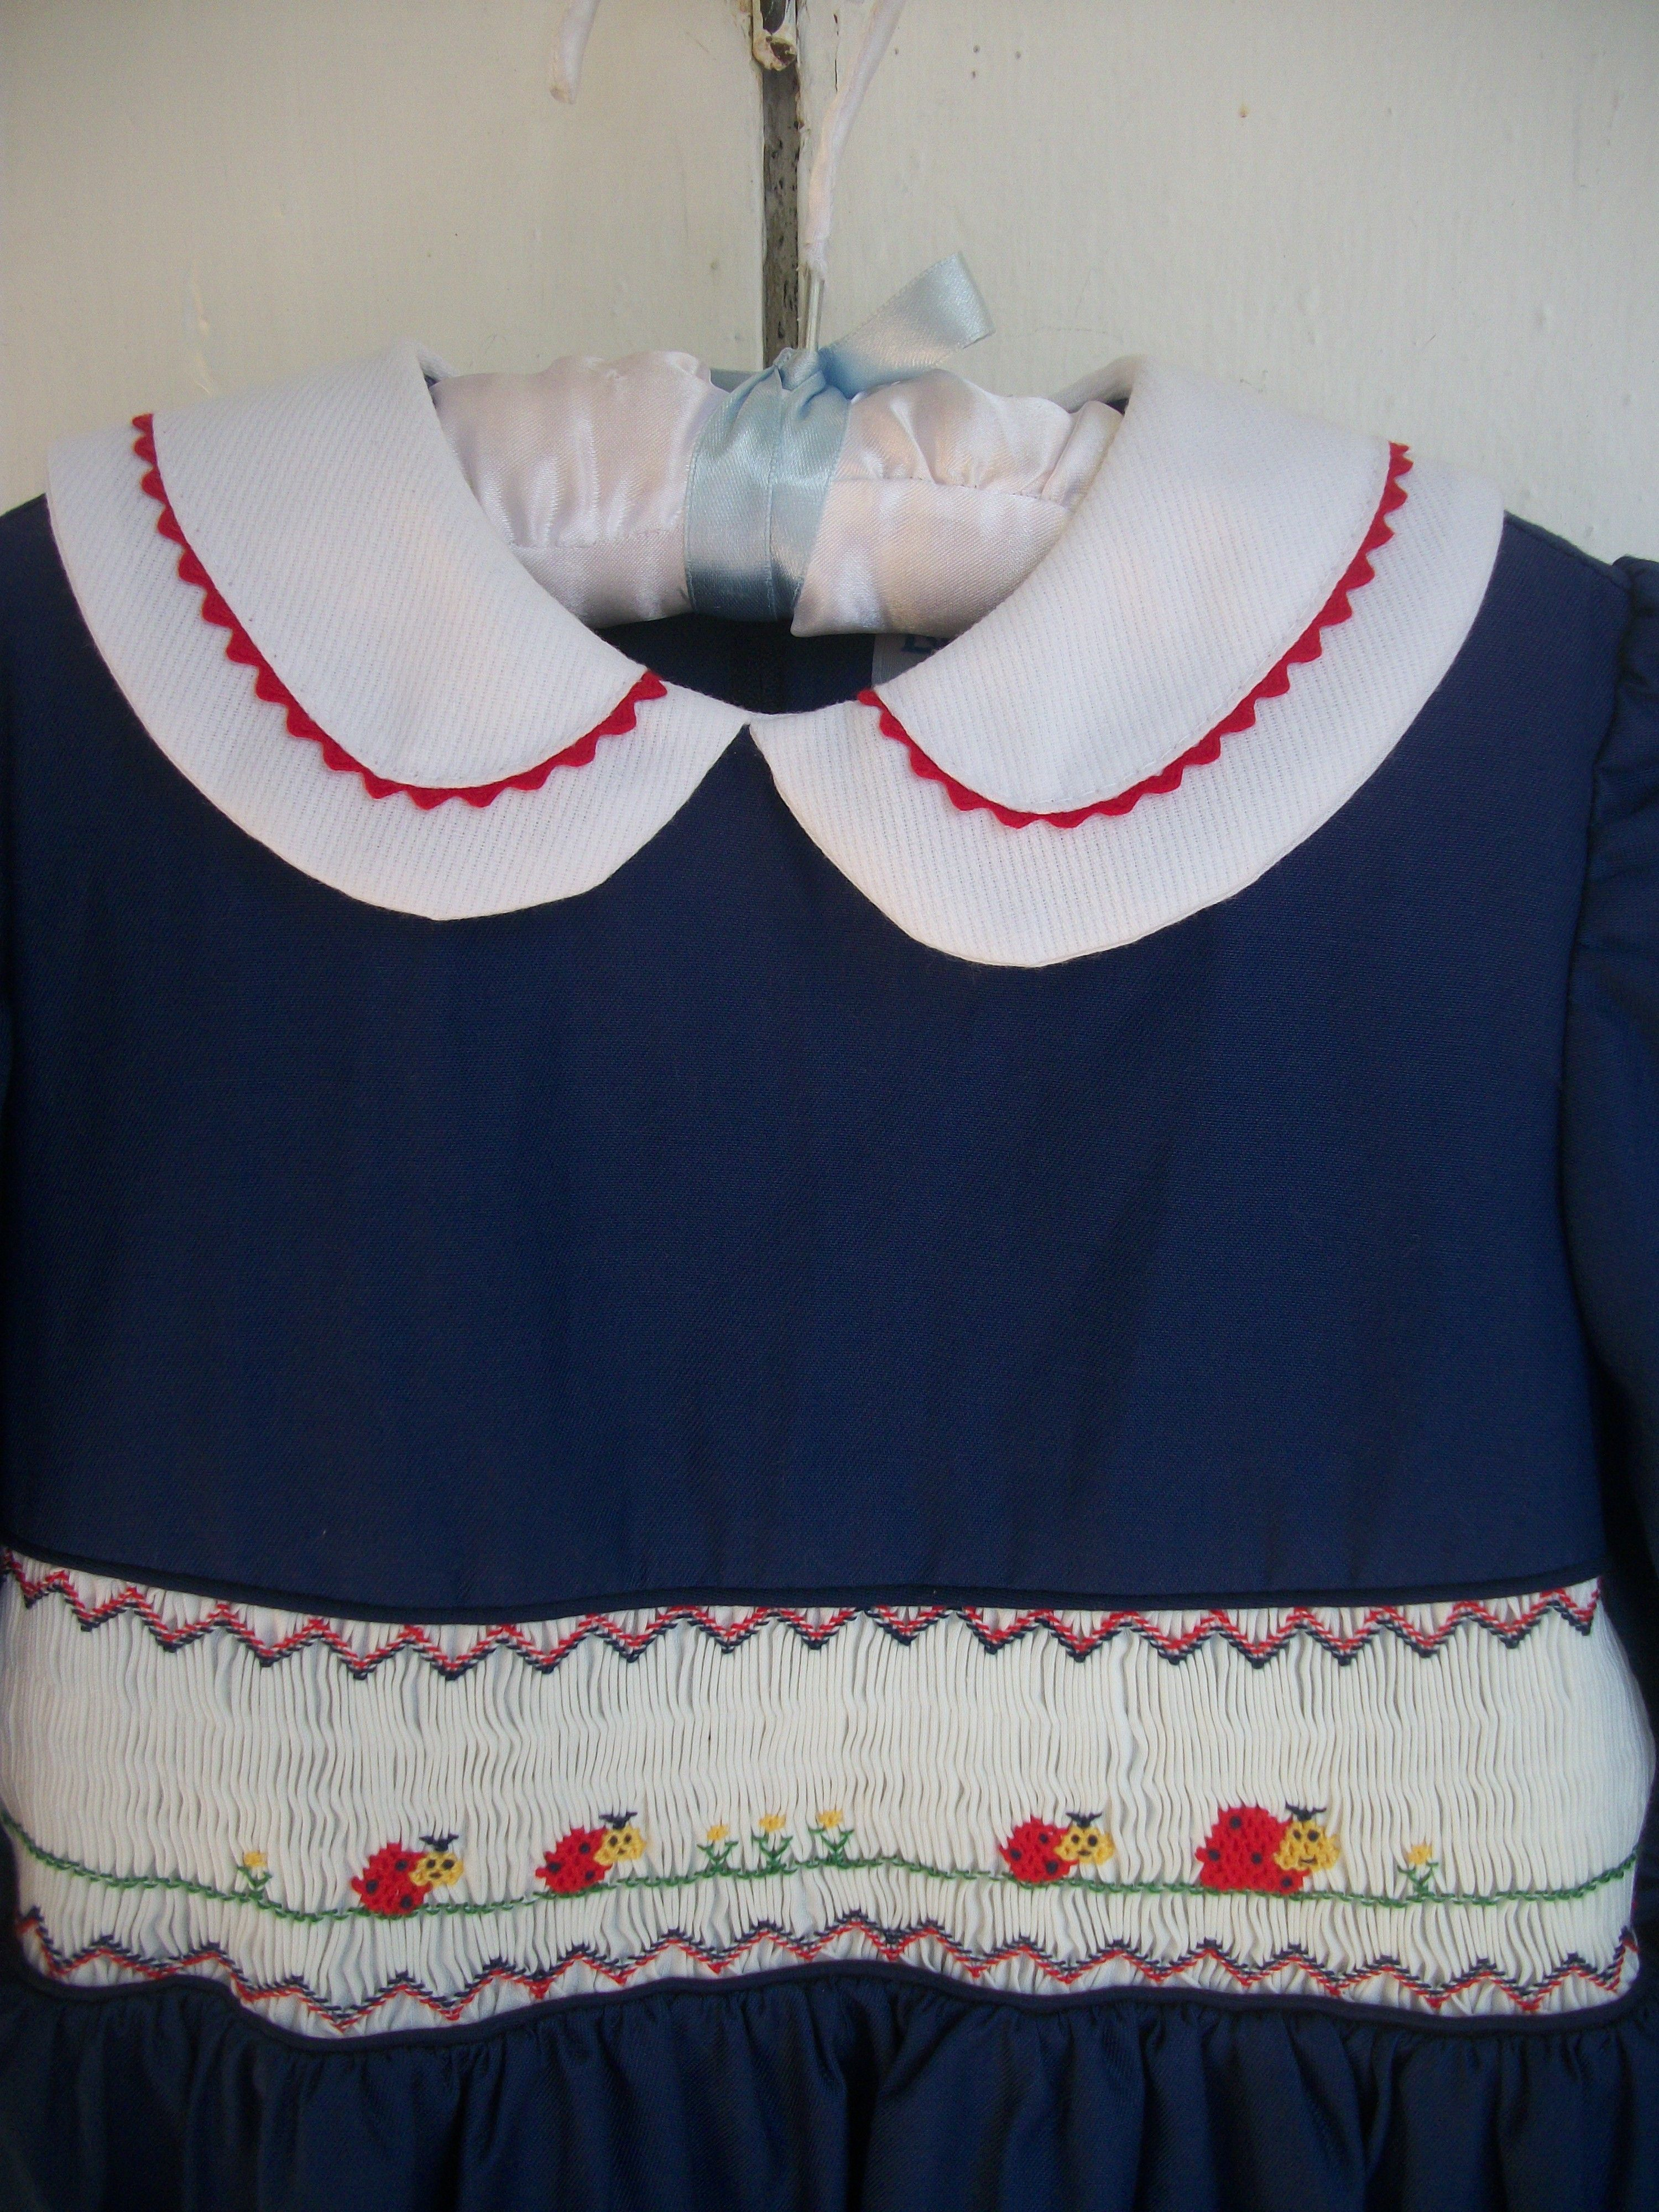 ADORABLE LULI & ME FANCY NAVY BLUE DRESS LADYBUGS SPECIAL OCCASION PHOTOS ~ SIZE 6 http://cgi.ebay.com/ws/eBayISAPI.dll?ViewItem&item=121183131290